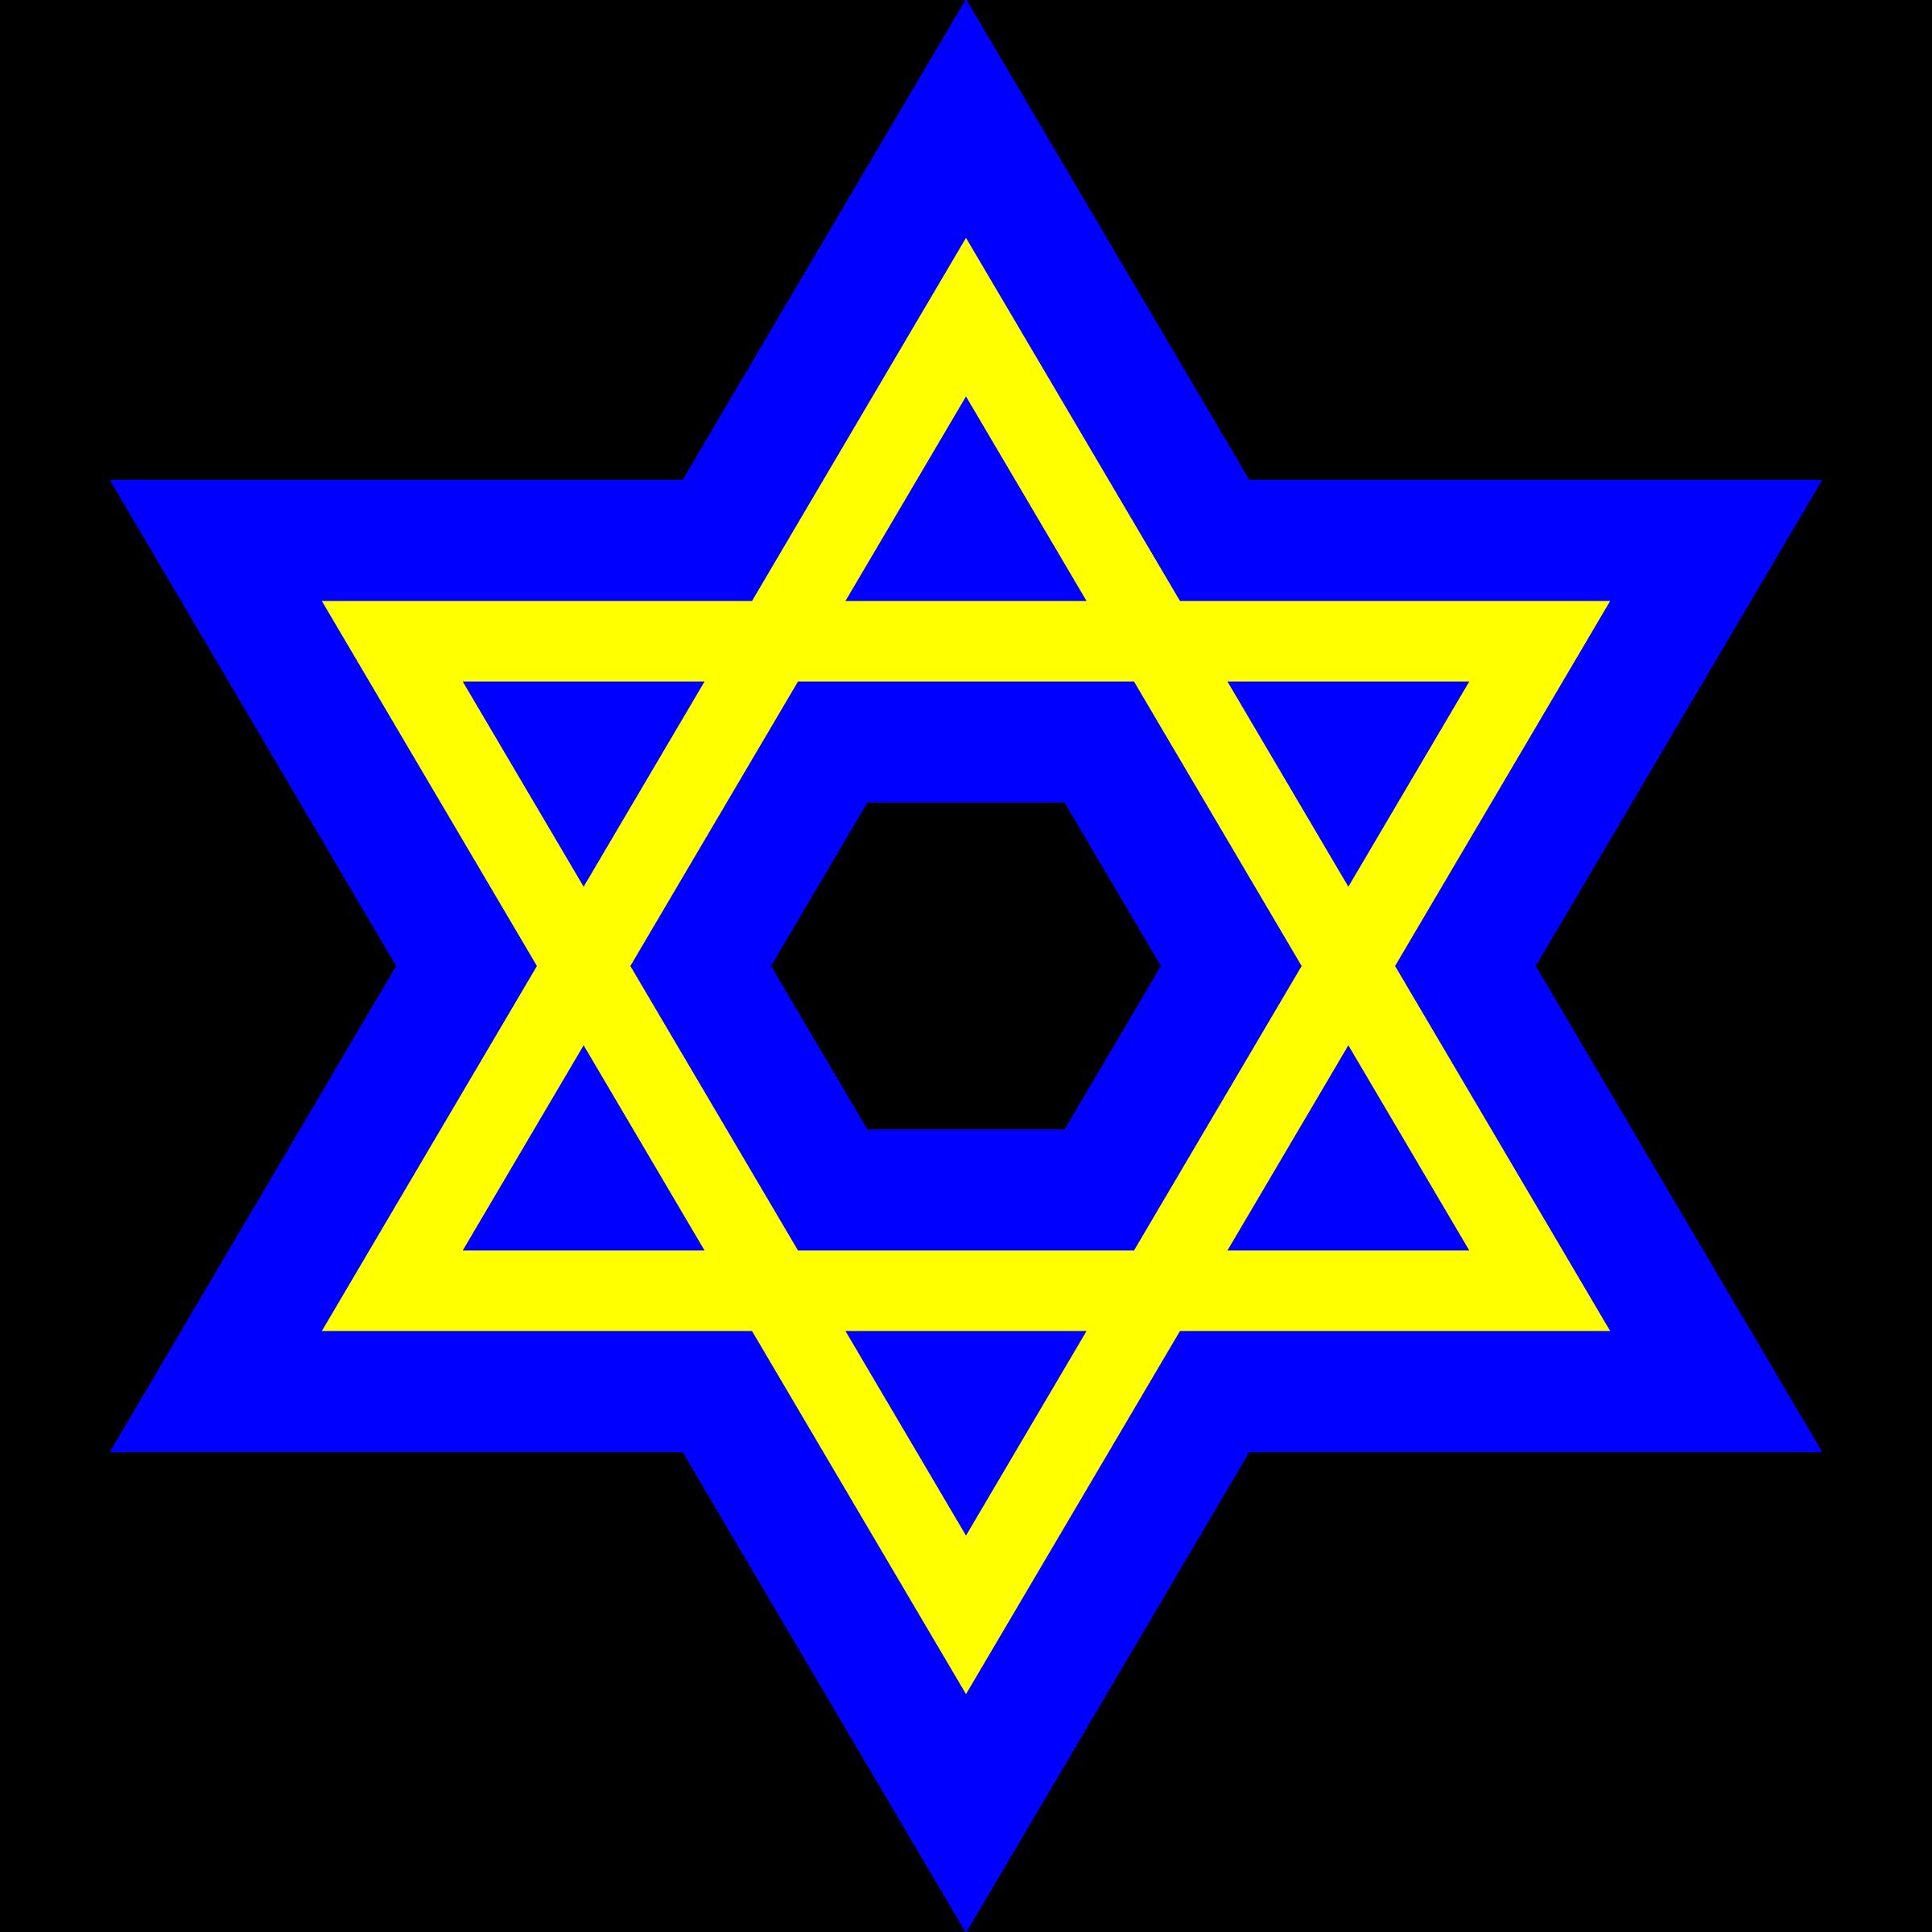 Star of david clipart free Clipart - VA-003 Judaism free